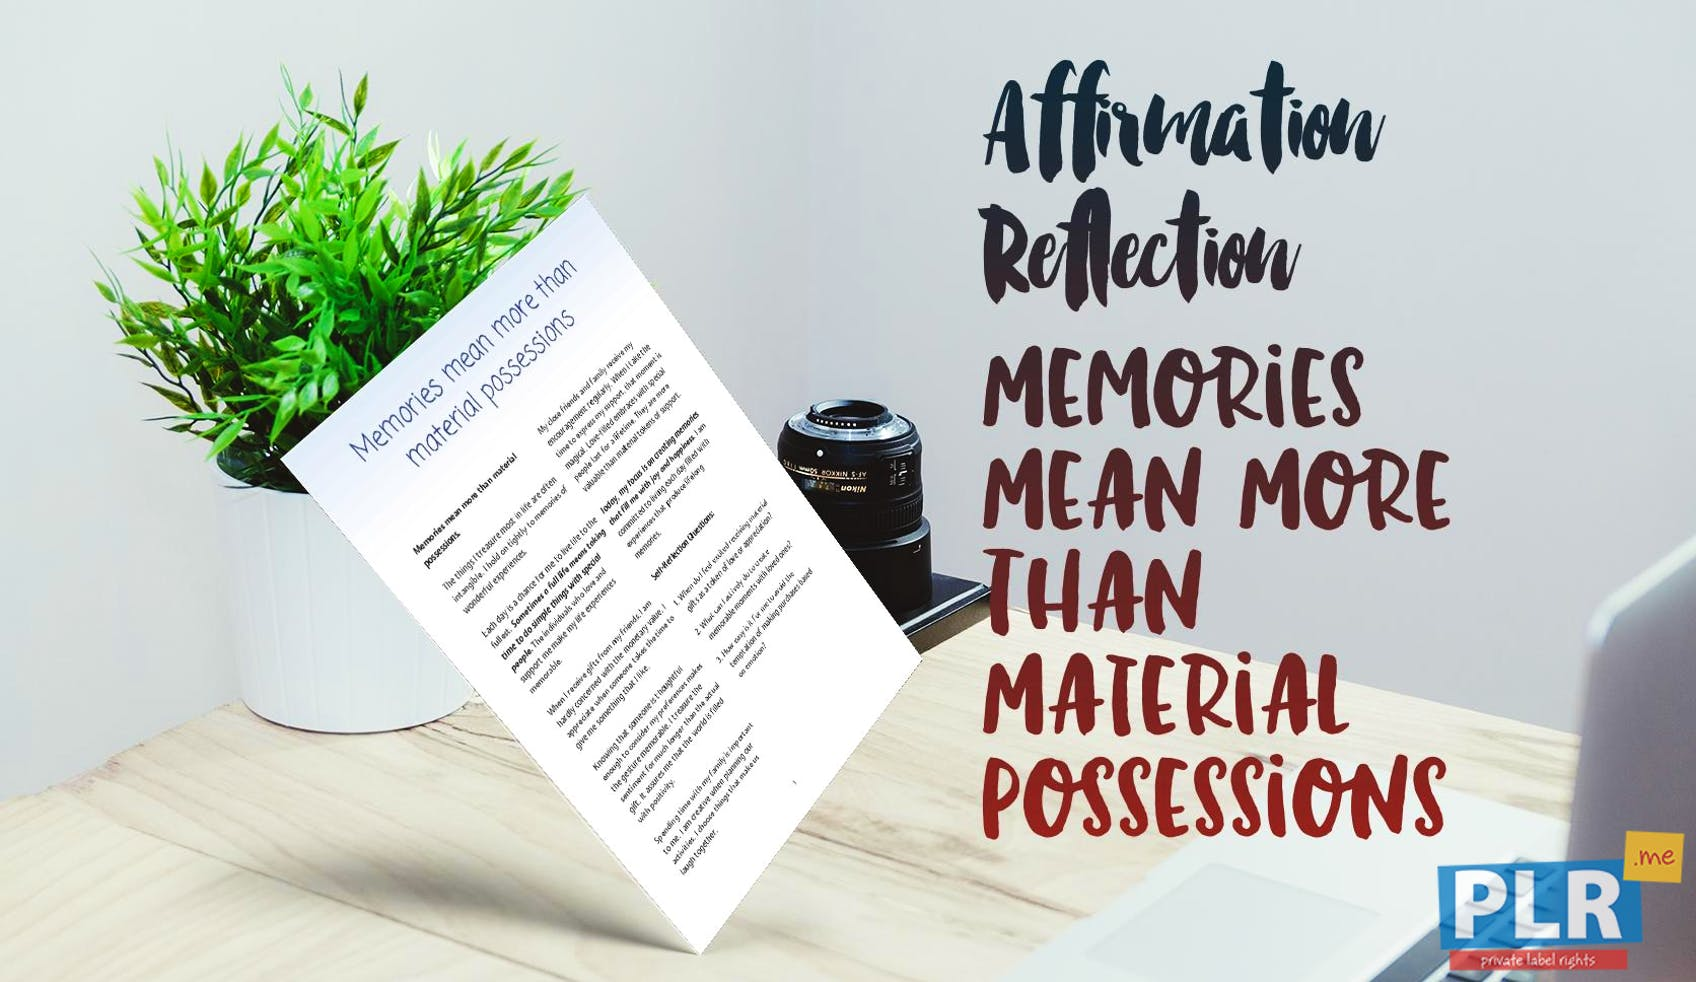 Memories Mean More Than Material Possessions